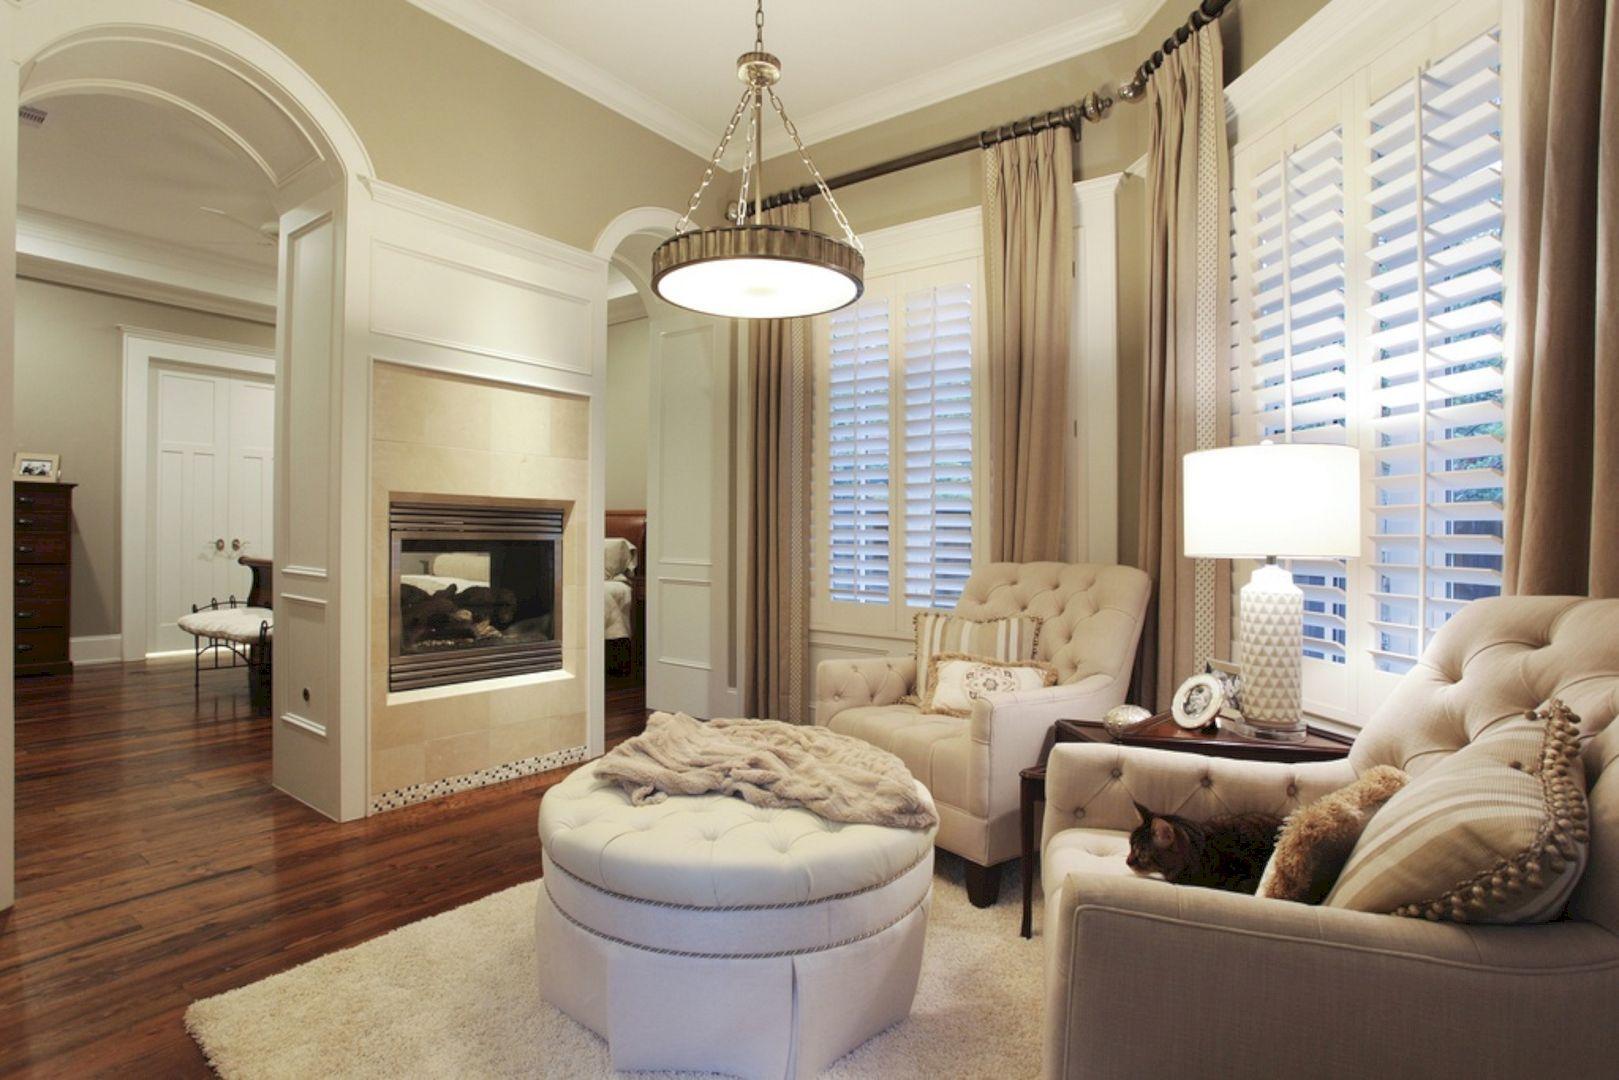 Luxury master bedroom plan   Luxury Master Bedroom Designs  Fix R Up  Pinterest  Luxury